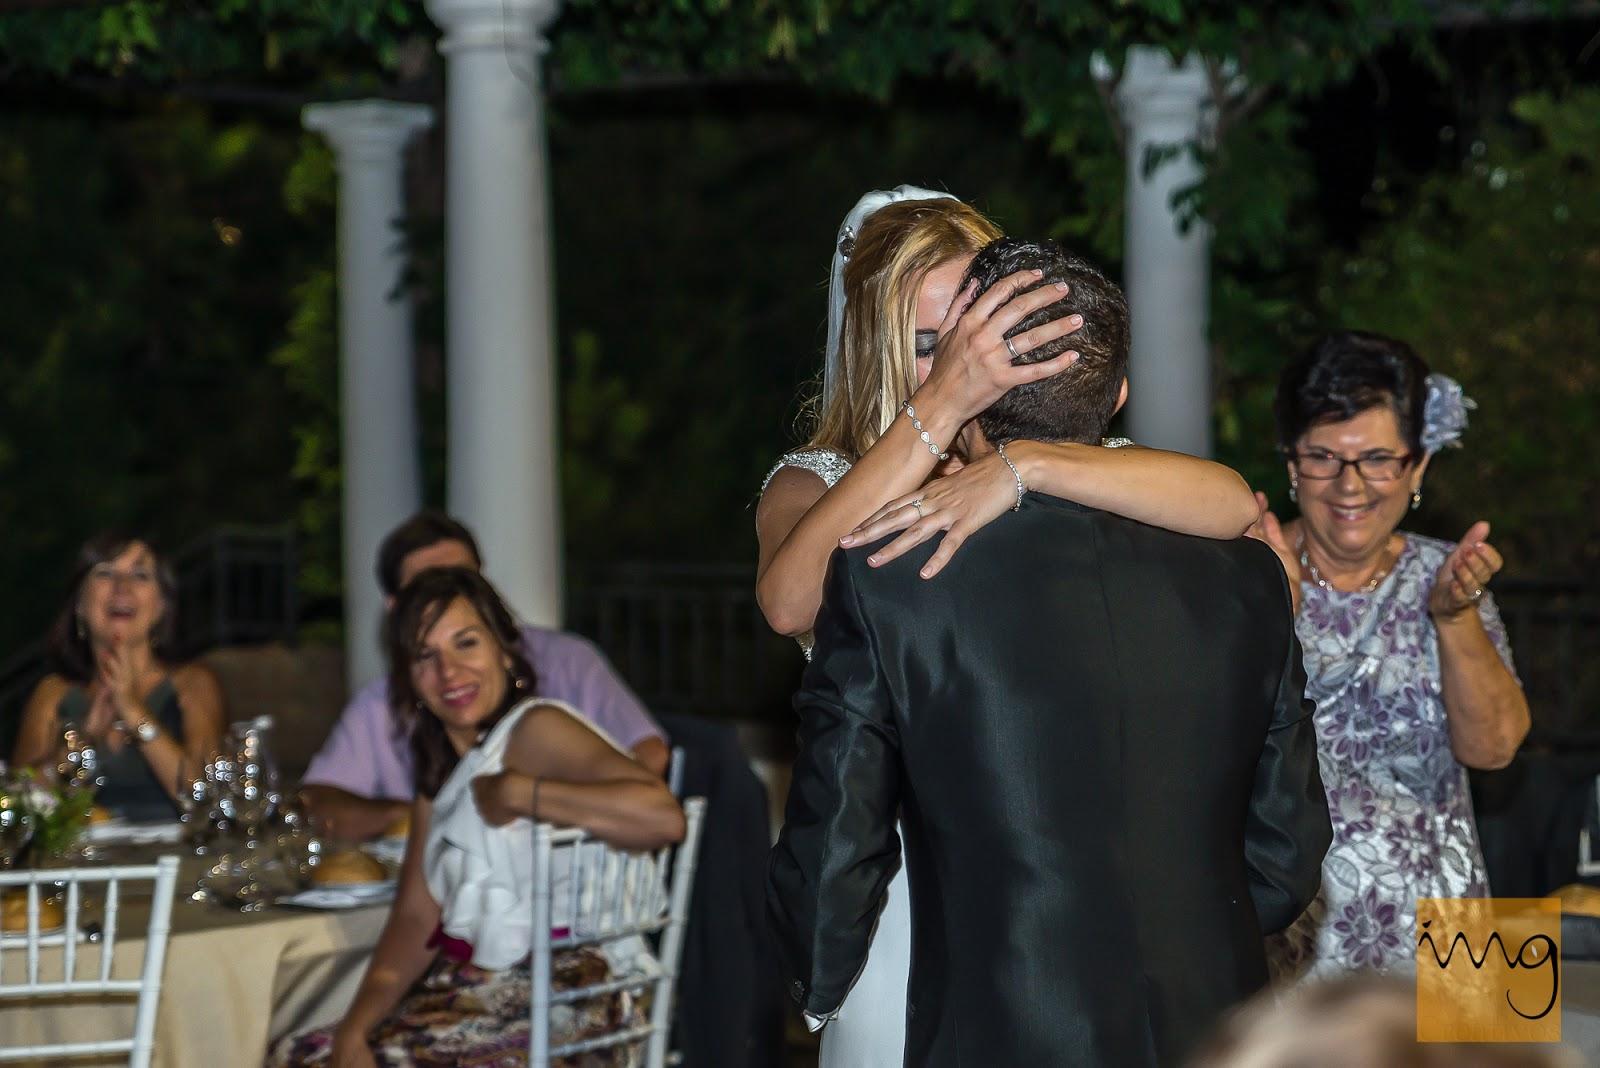 Beso espontáneo de boda